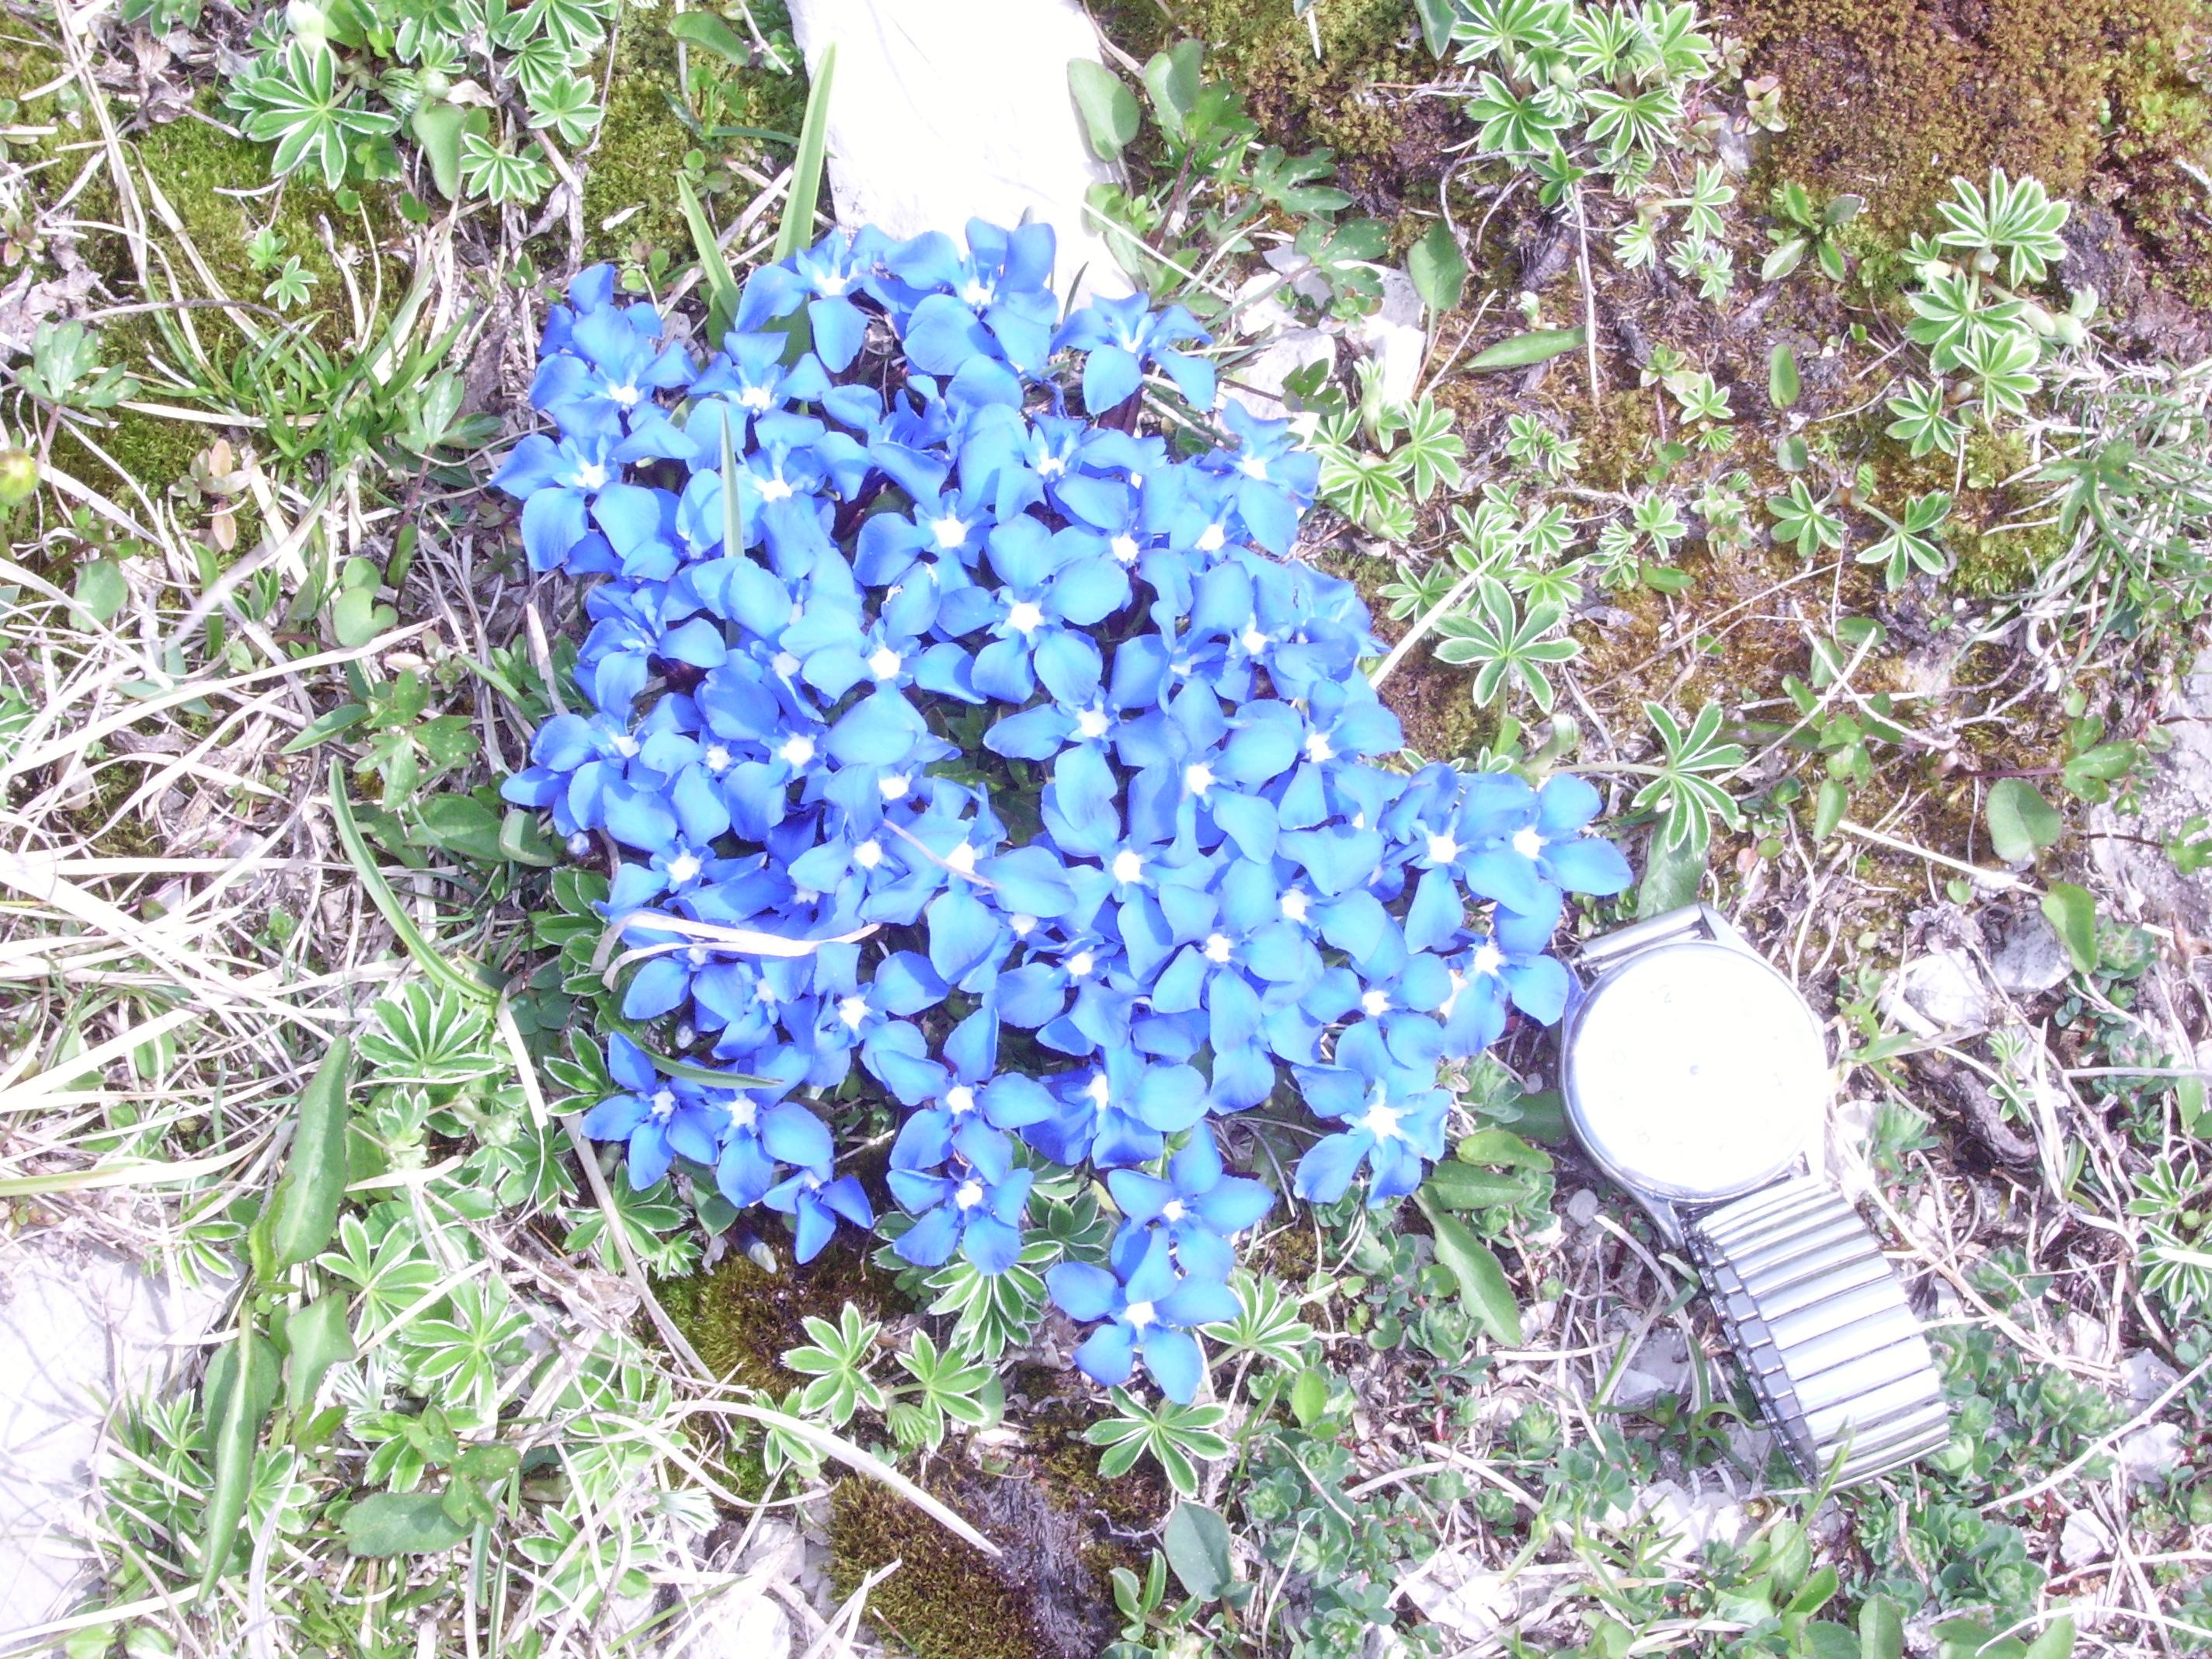 gentiane de printemps, un beau bleu